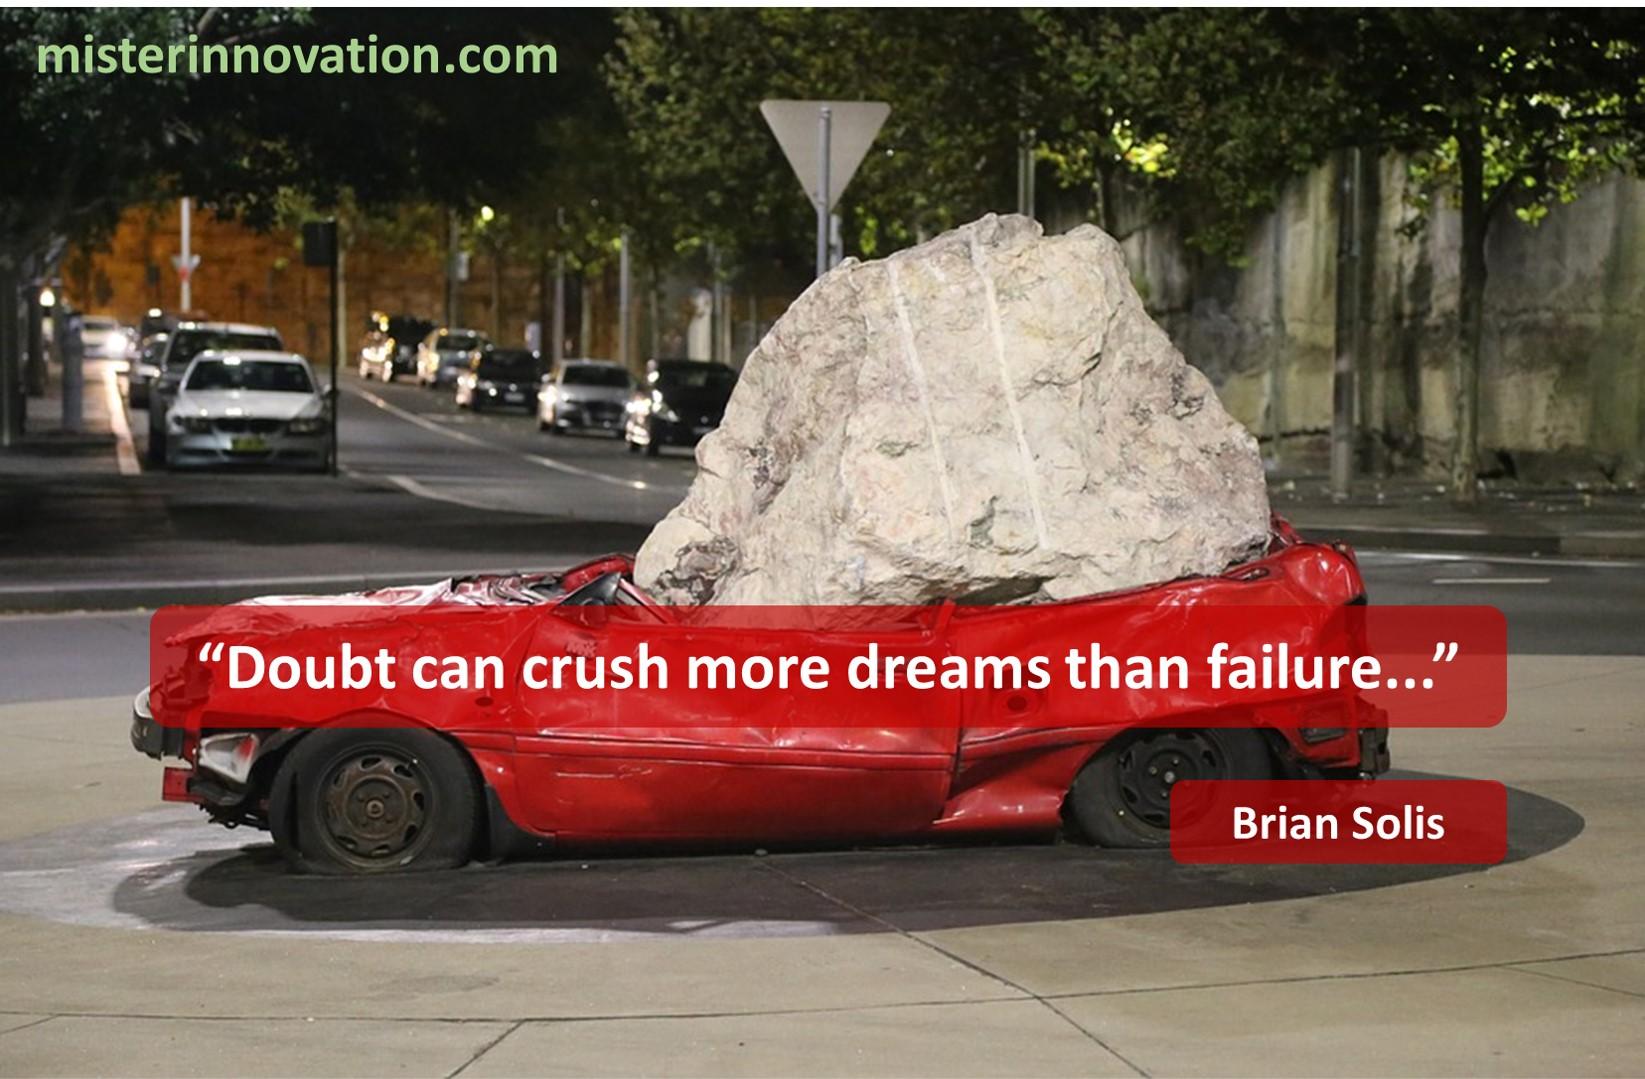 Brian Solis Crush Dreams